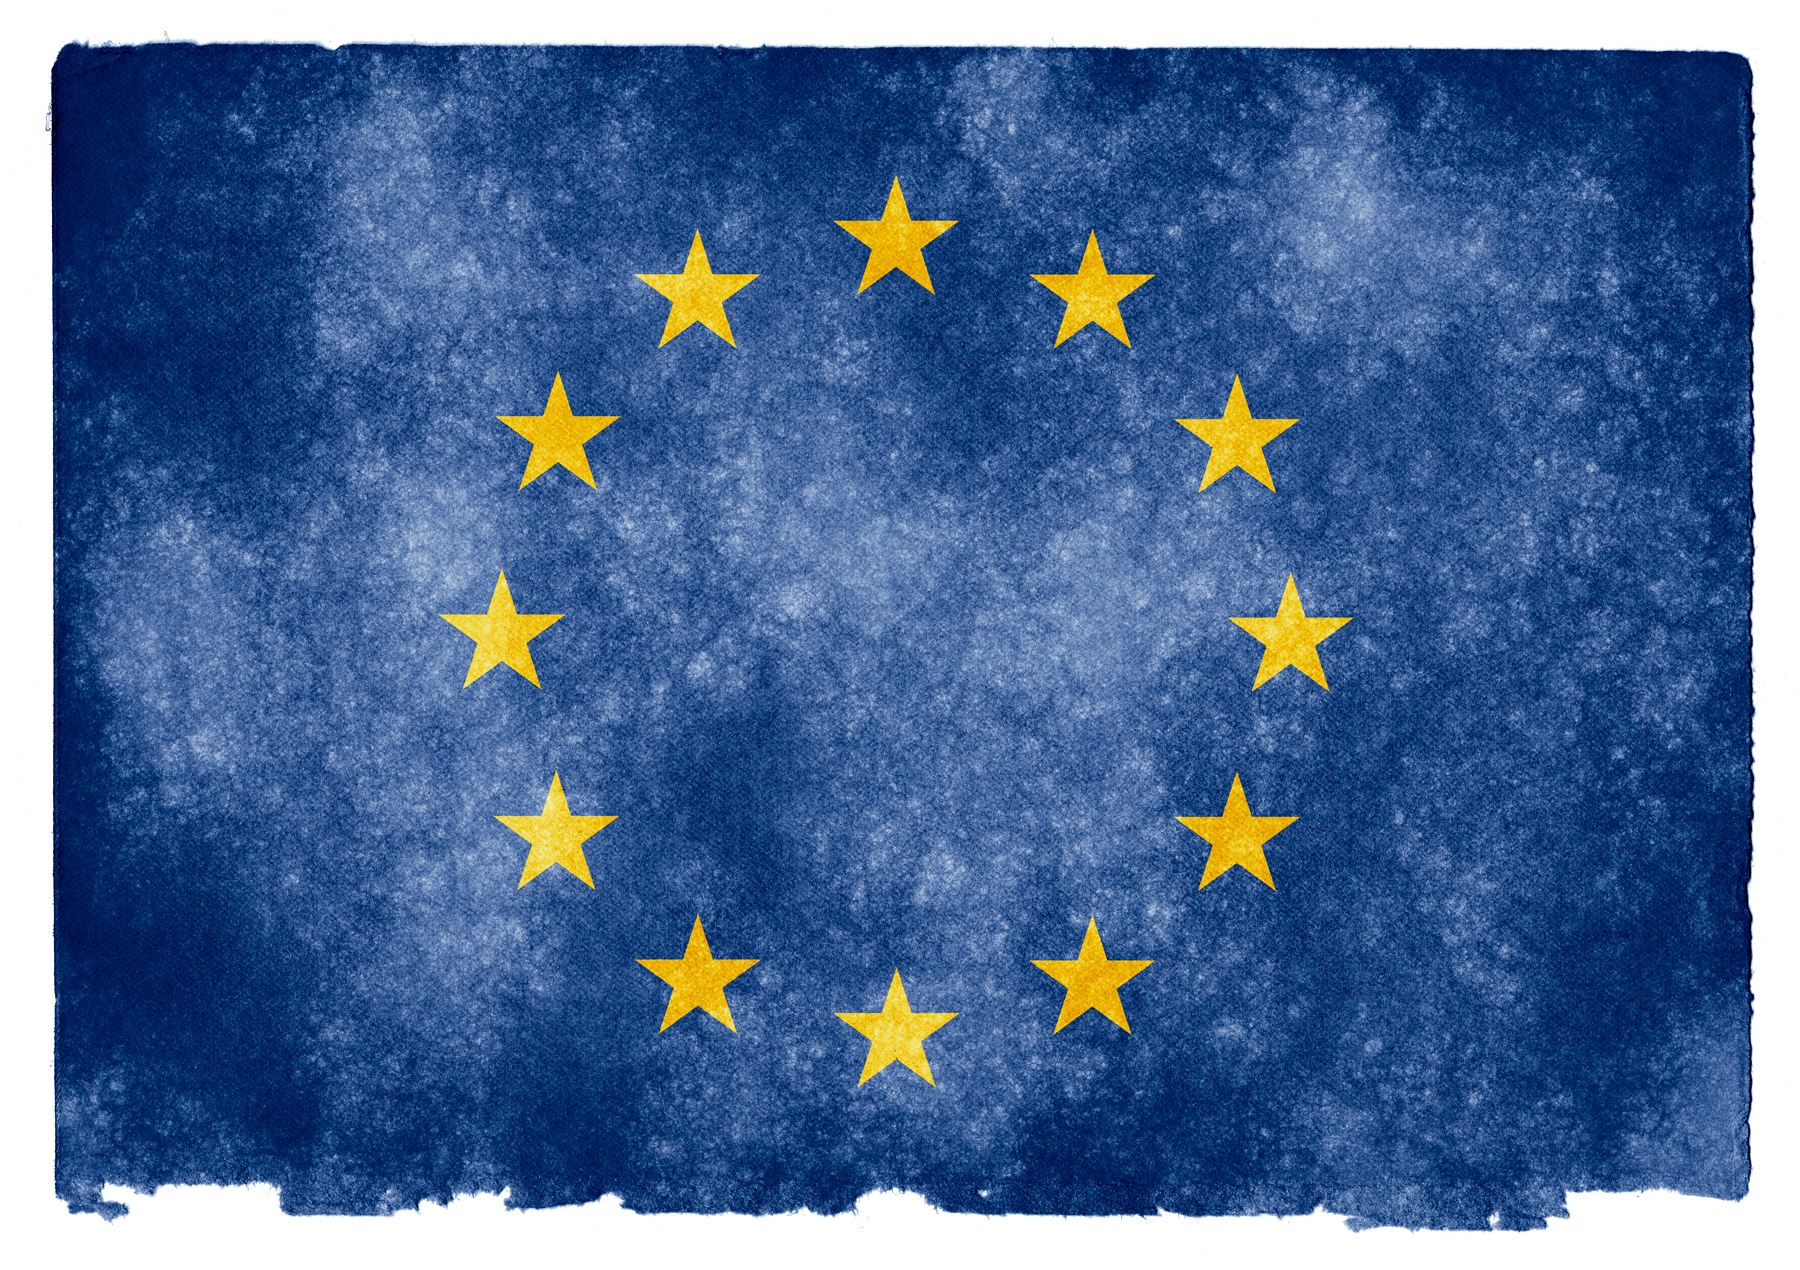 EU Grunge Flag  Flickr  Photo Sharing